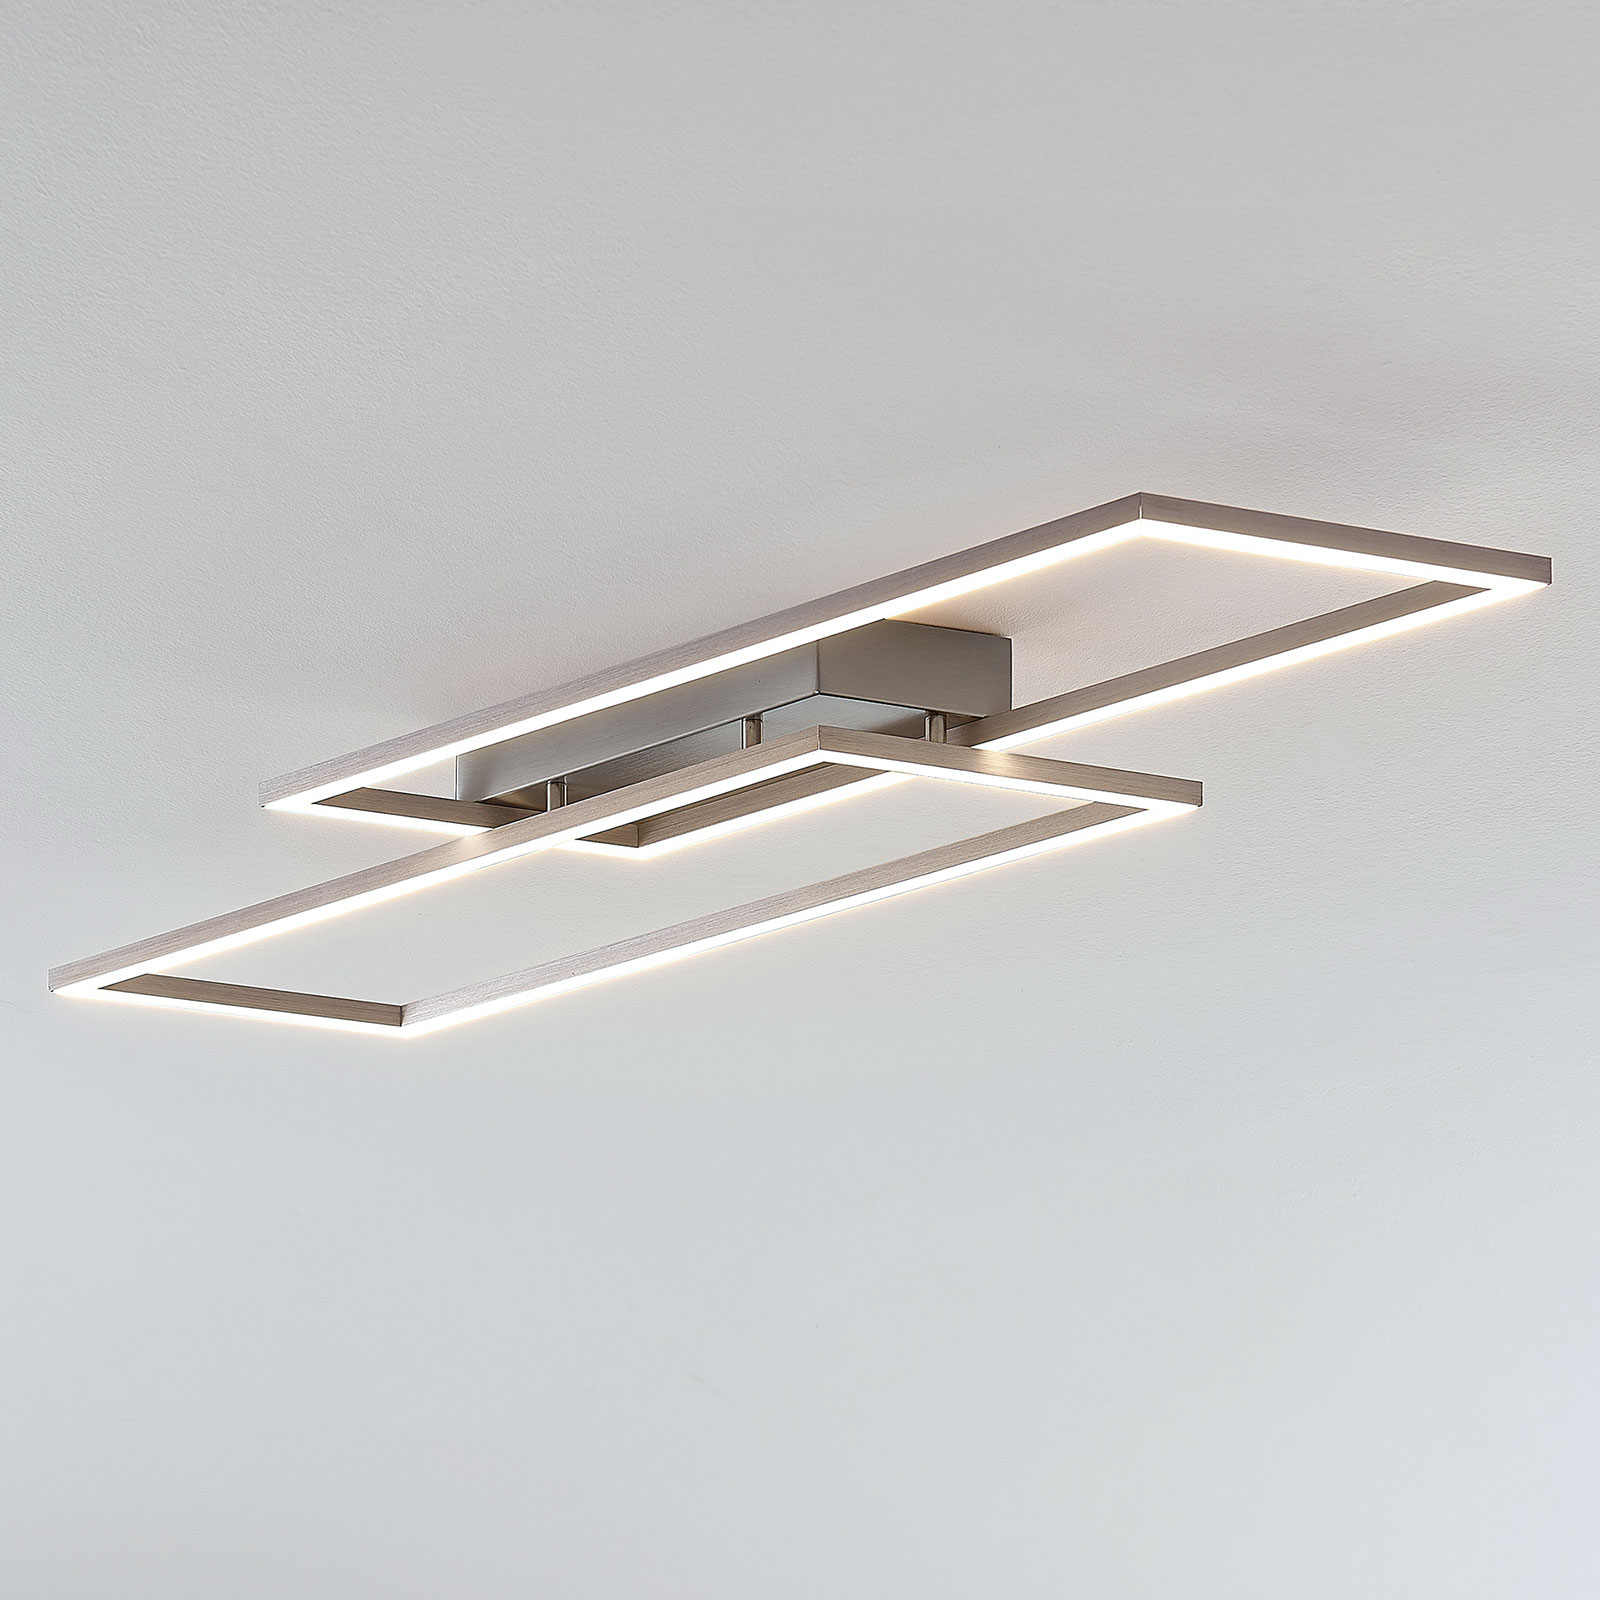 LED-Deckenlampe Quadra, dimmbar, 2-flg., 83,6 cm